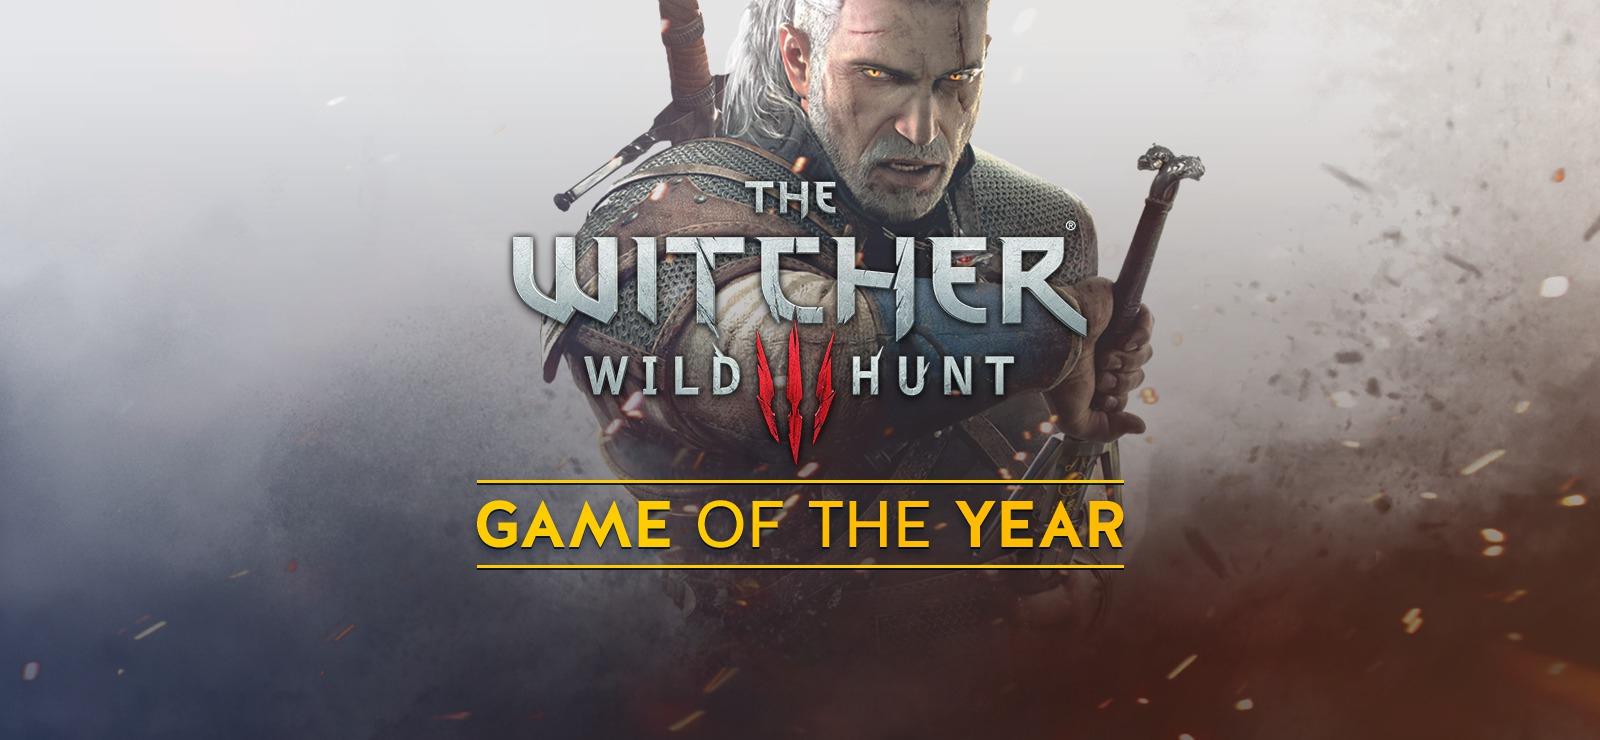 -69% Gamebundel The Witcher (PC) @ Gog.com